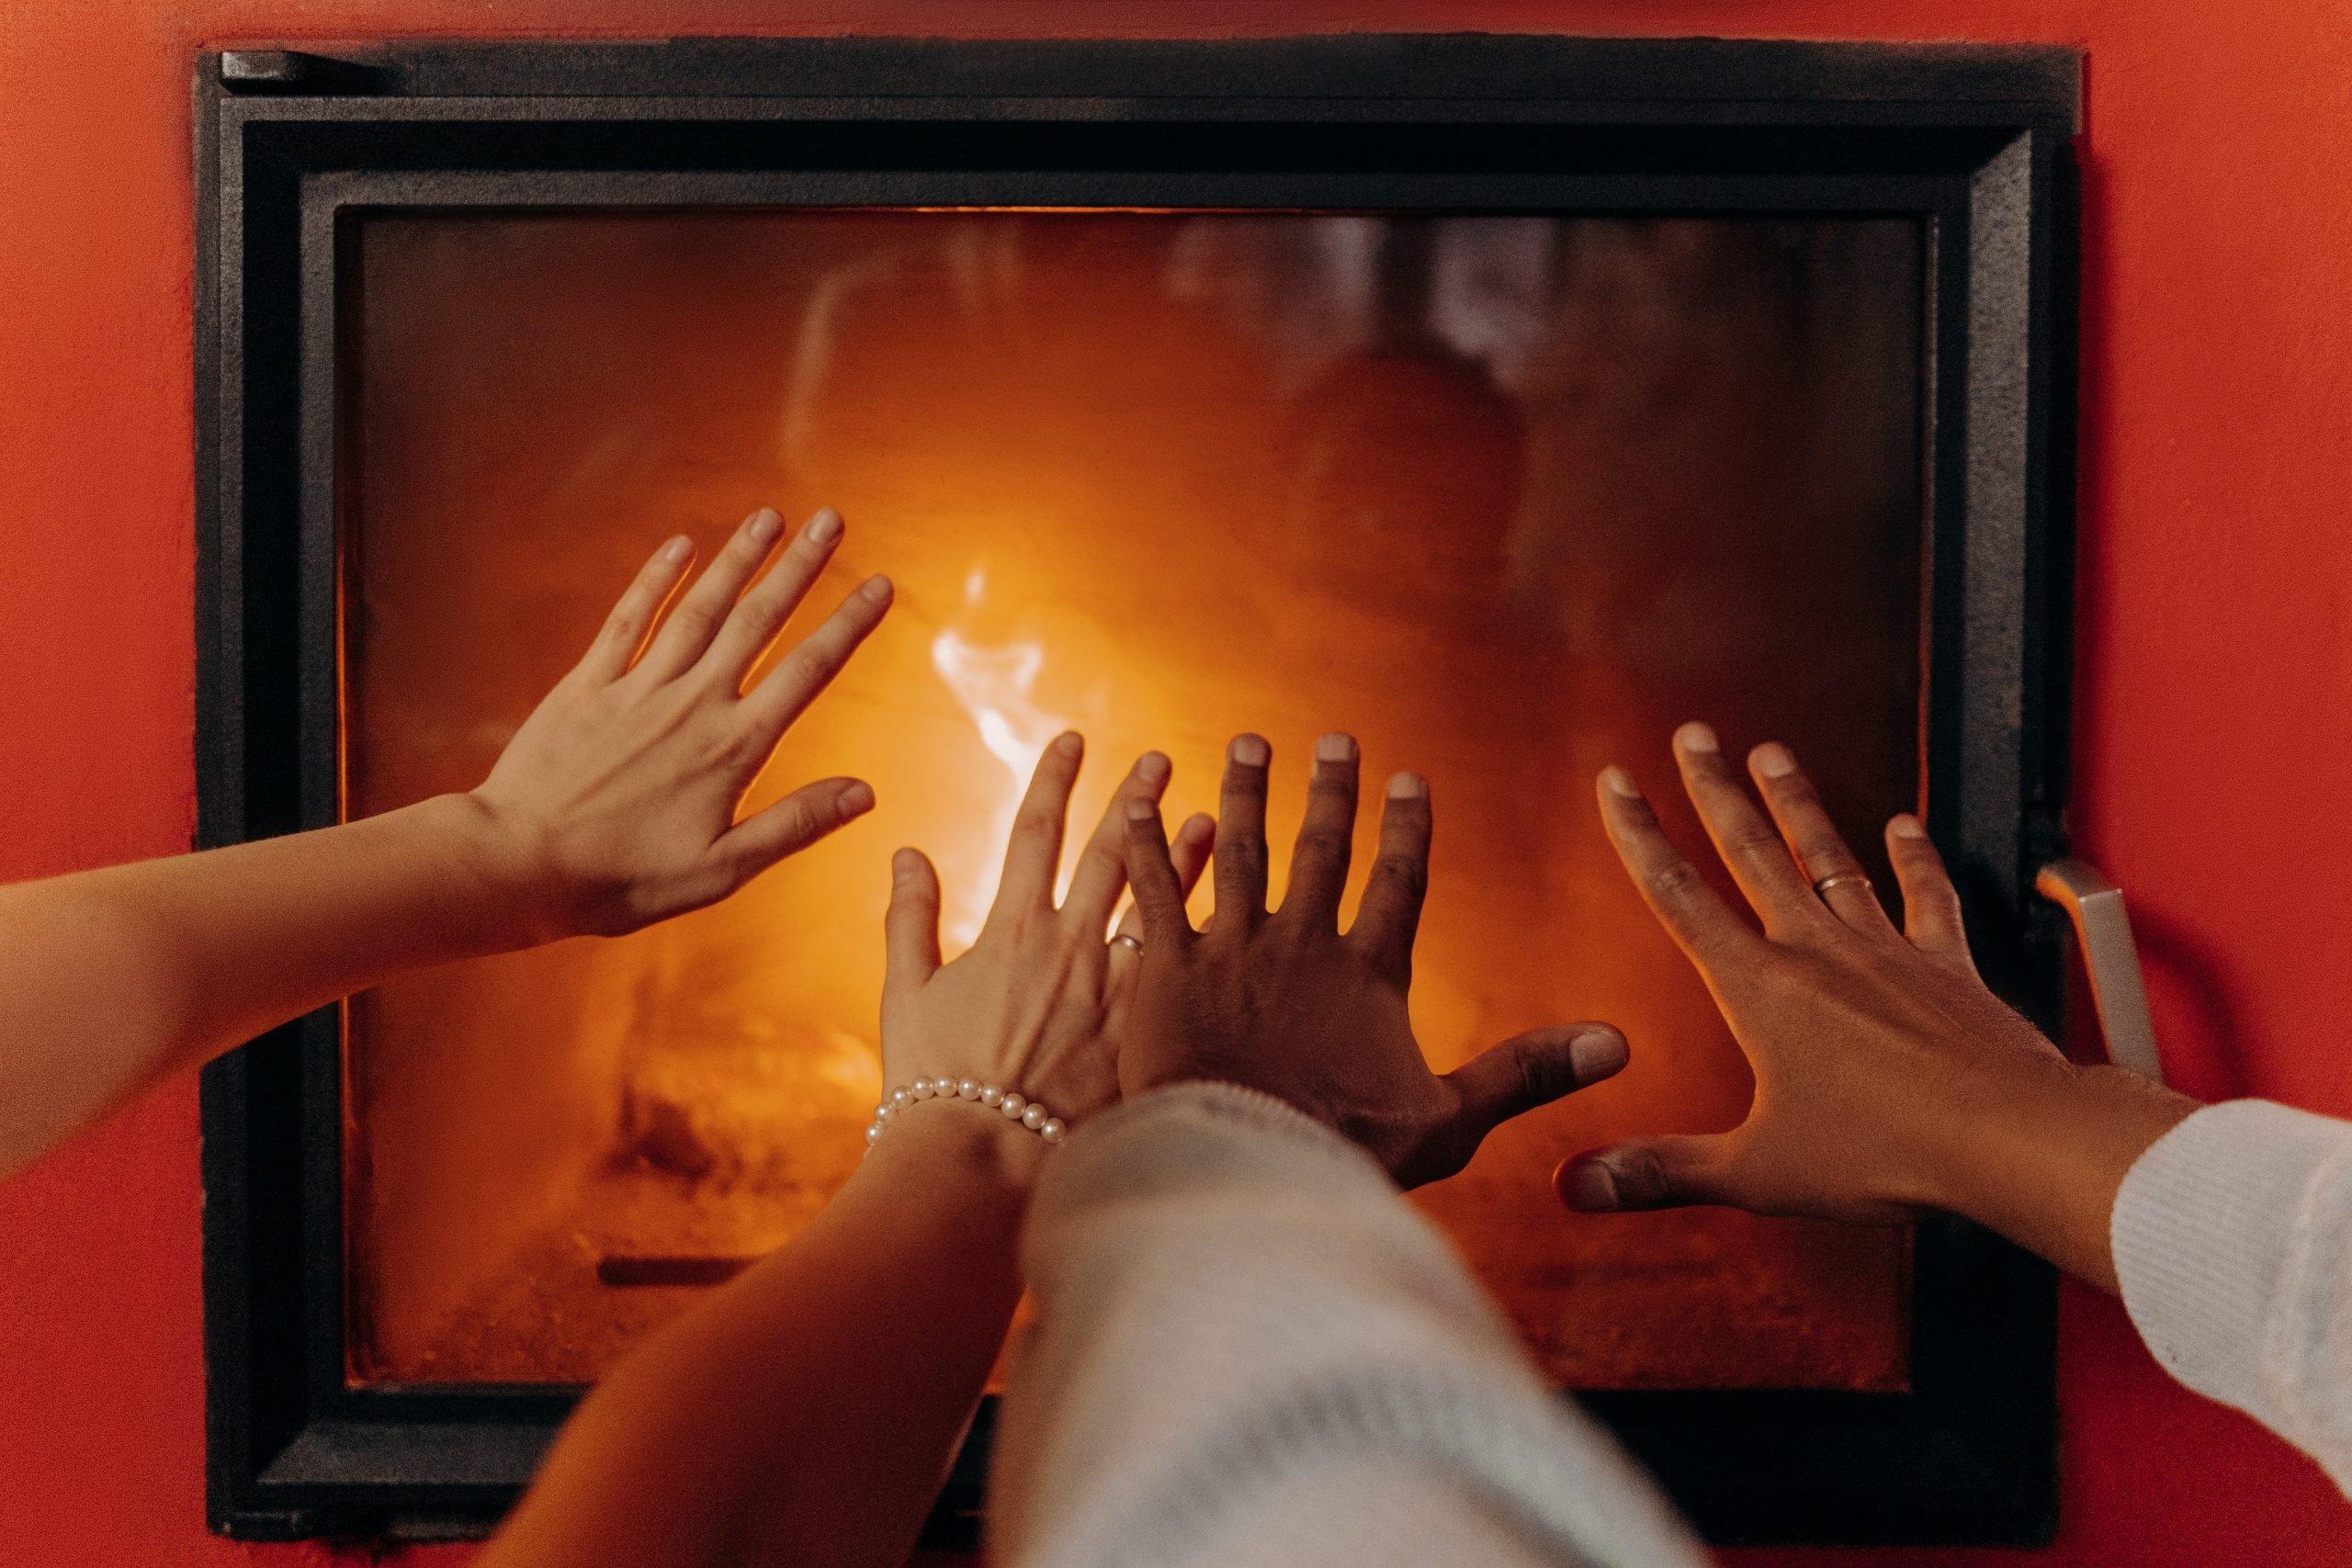 A fire in a home.